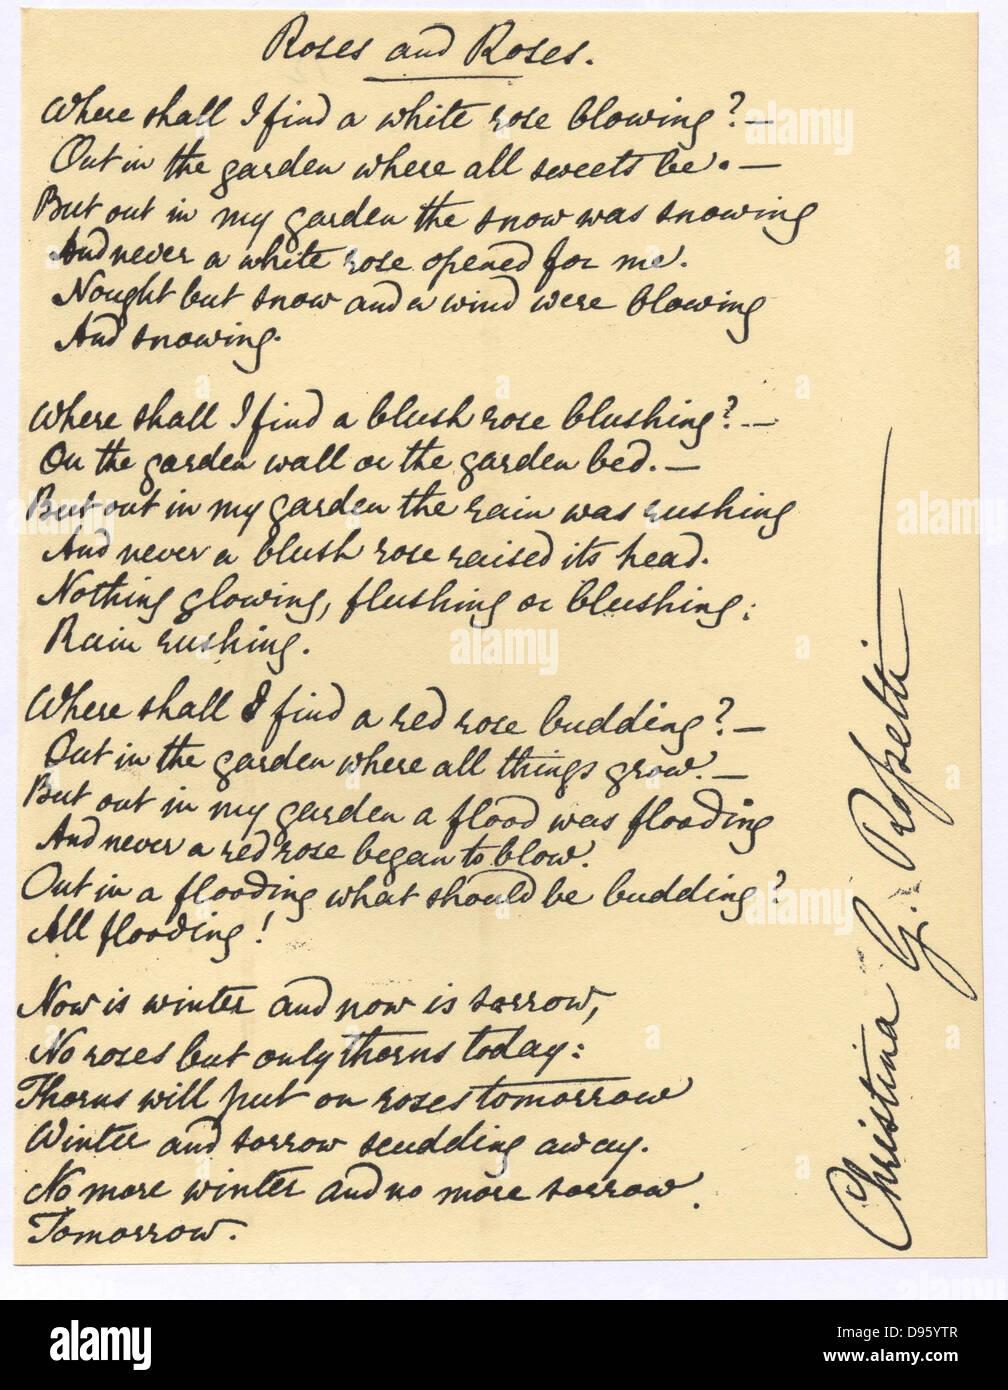 Manuscript of 'Roses and Roses', the poem by Christina Georgina Rosetti (1830-1894). - Stock Image